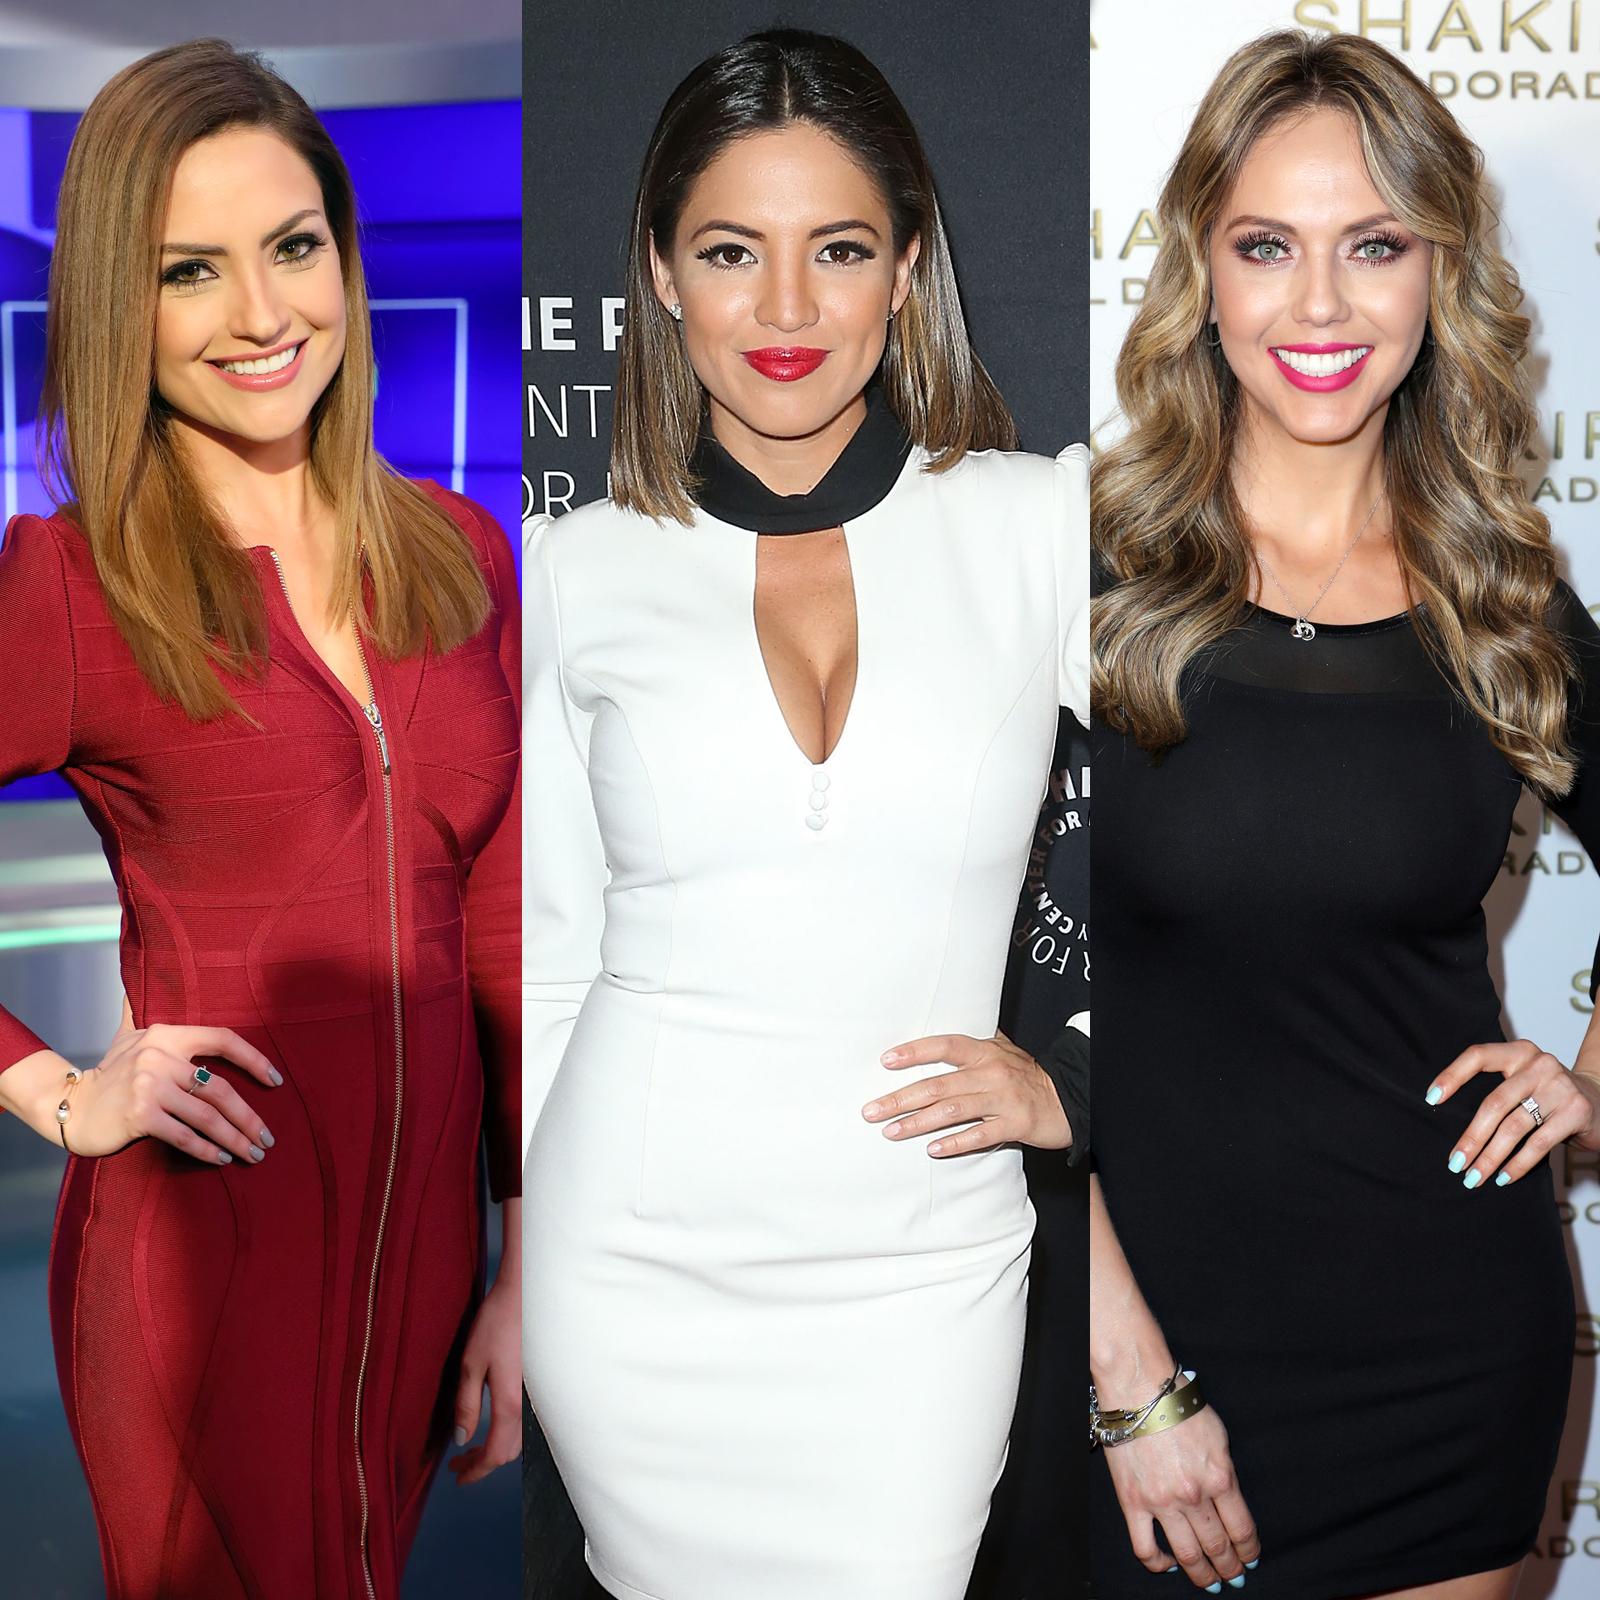 Michelle Galvan, Pamela Silva y Jessica Carrillo